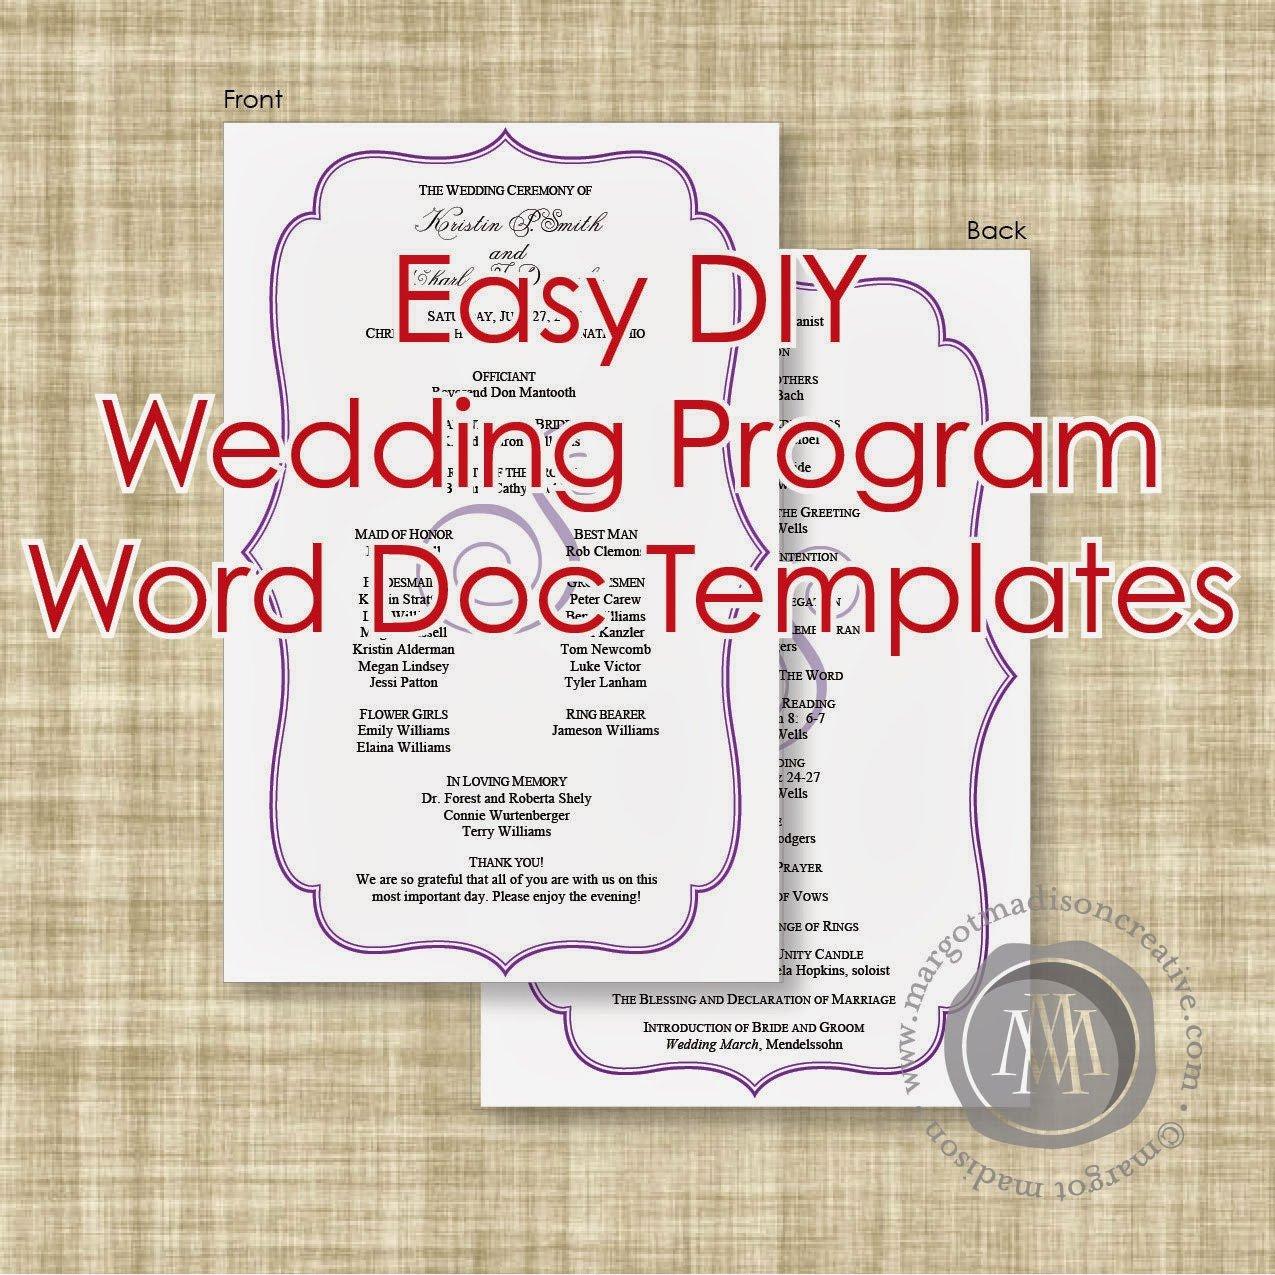 Templates for Wedding Programs Margotmadison Diy Wedding Program Word Doc Templates now